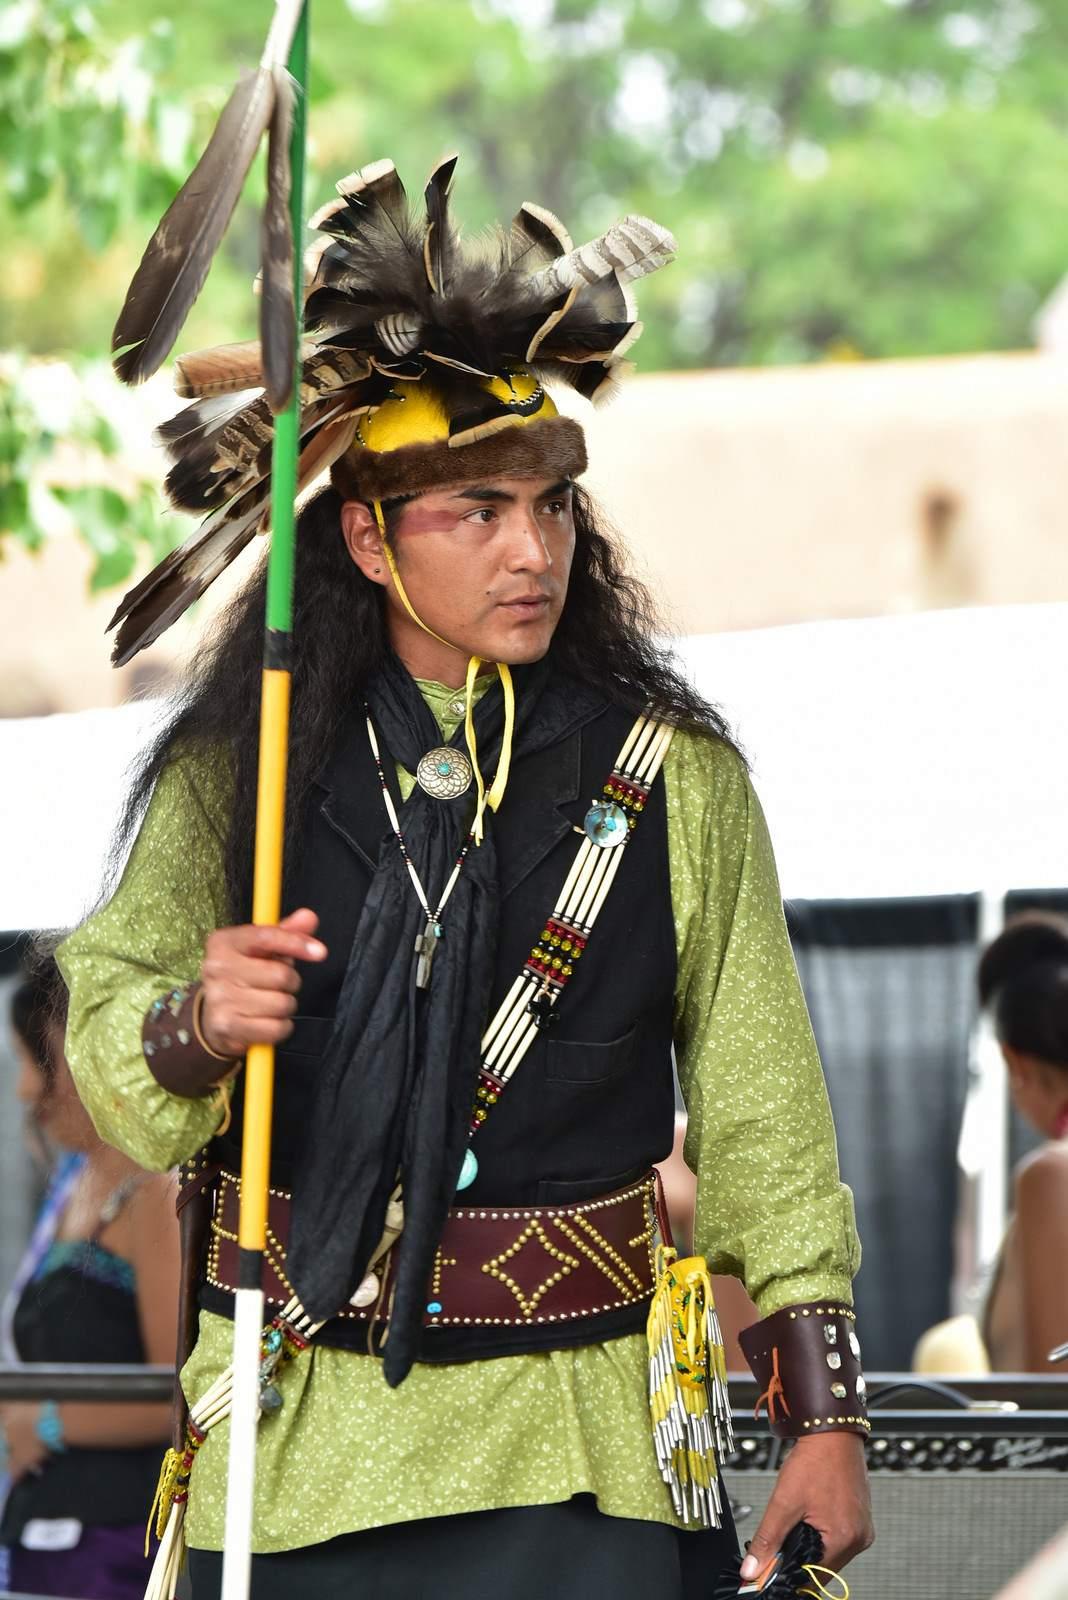 native american clothing5 Native American Clothing Contest at Santa Fe Indian Market